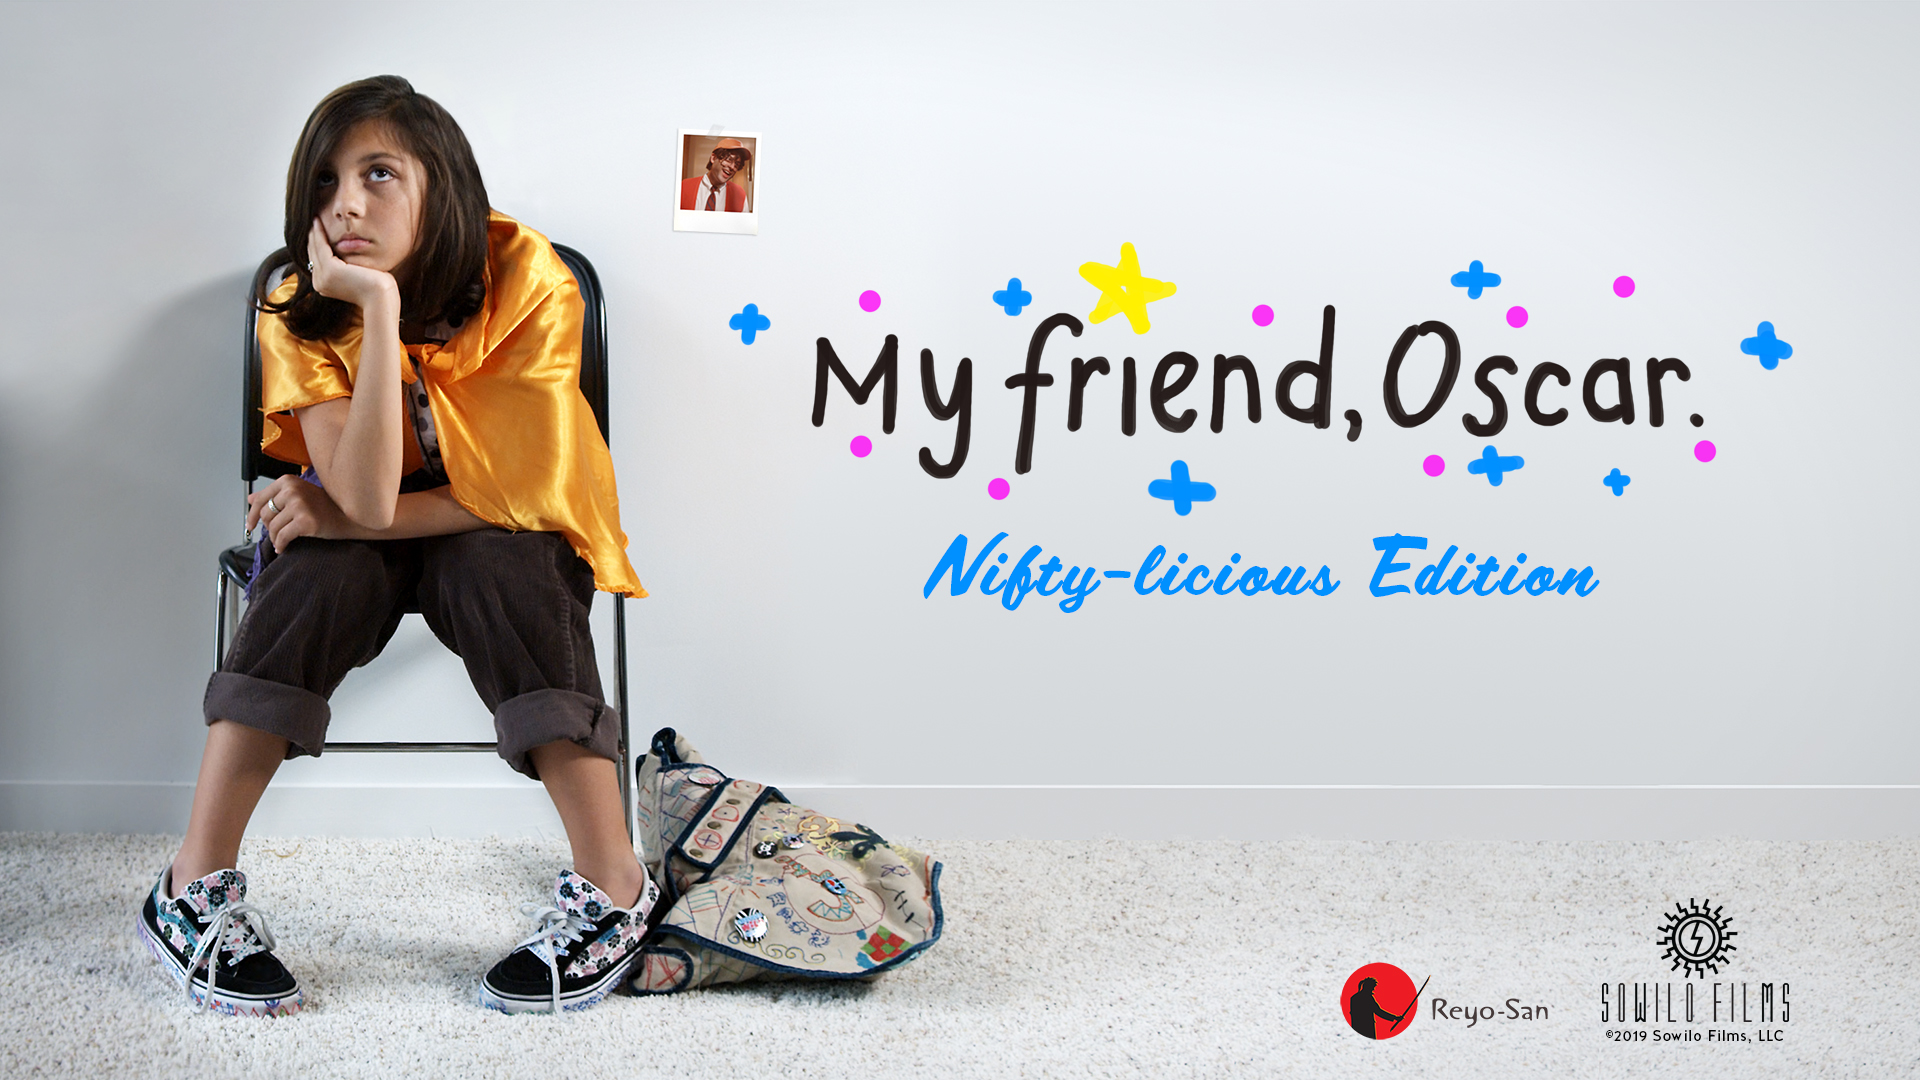 My friend, Oscar.: Nifty-licious Edition!